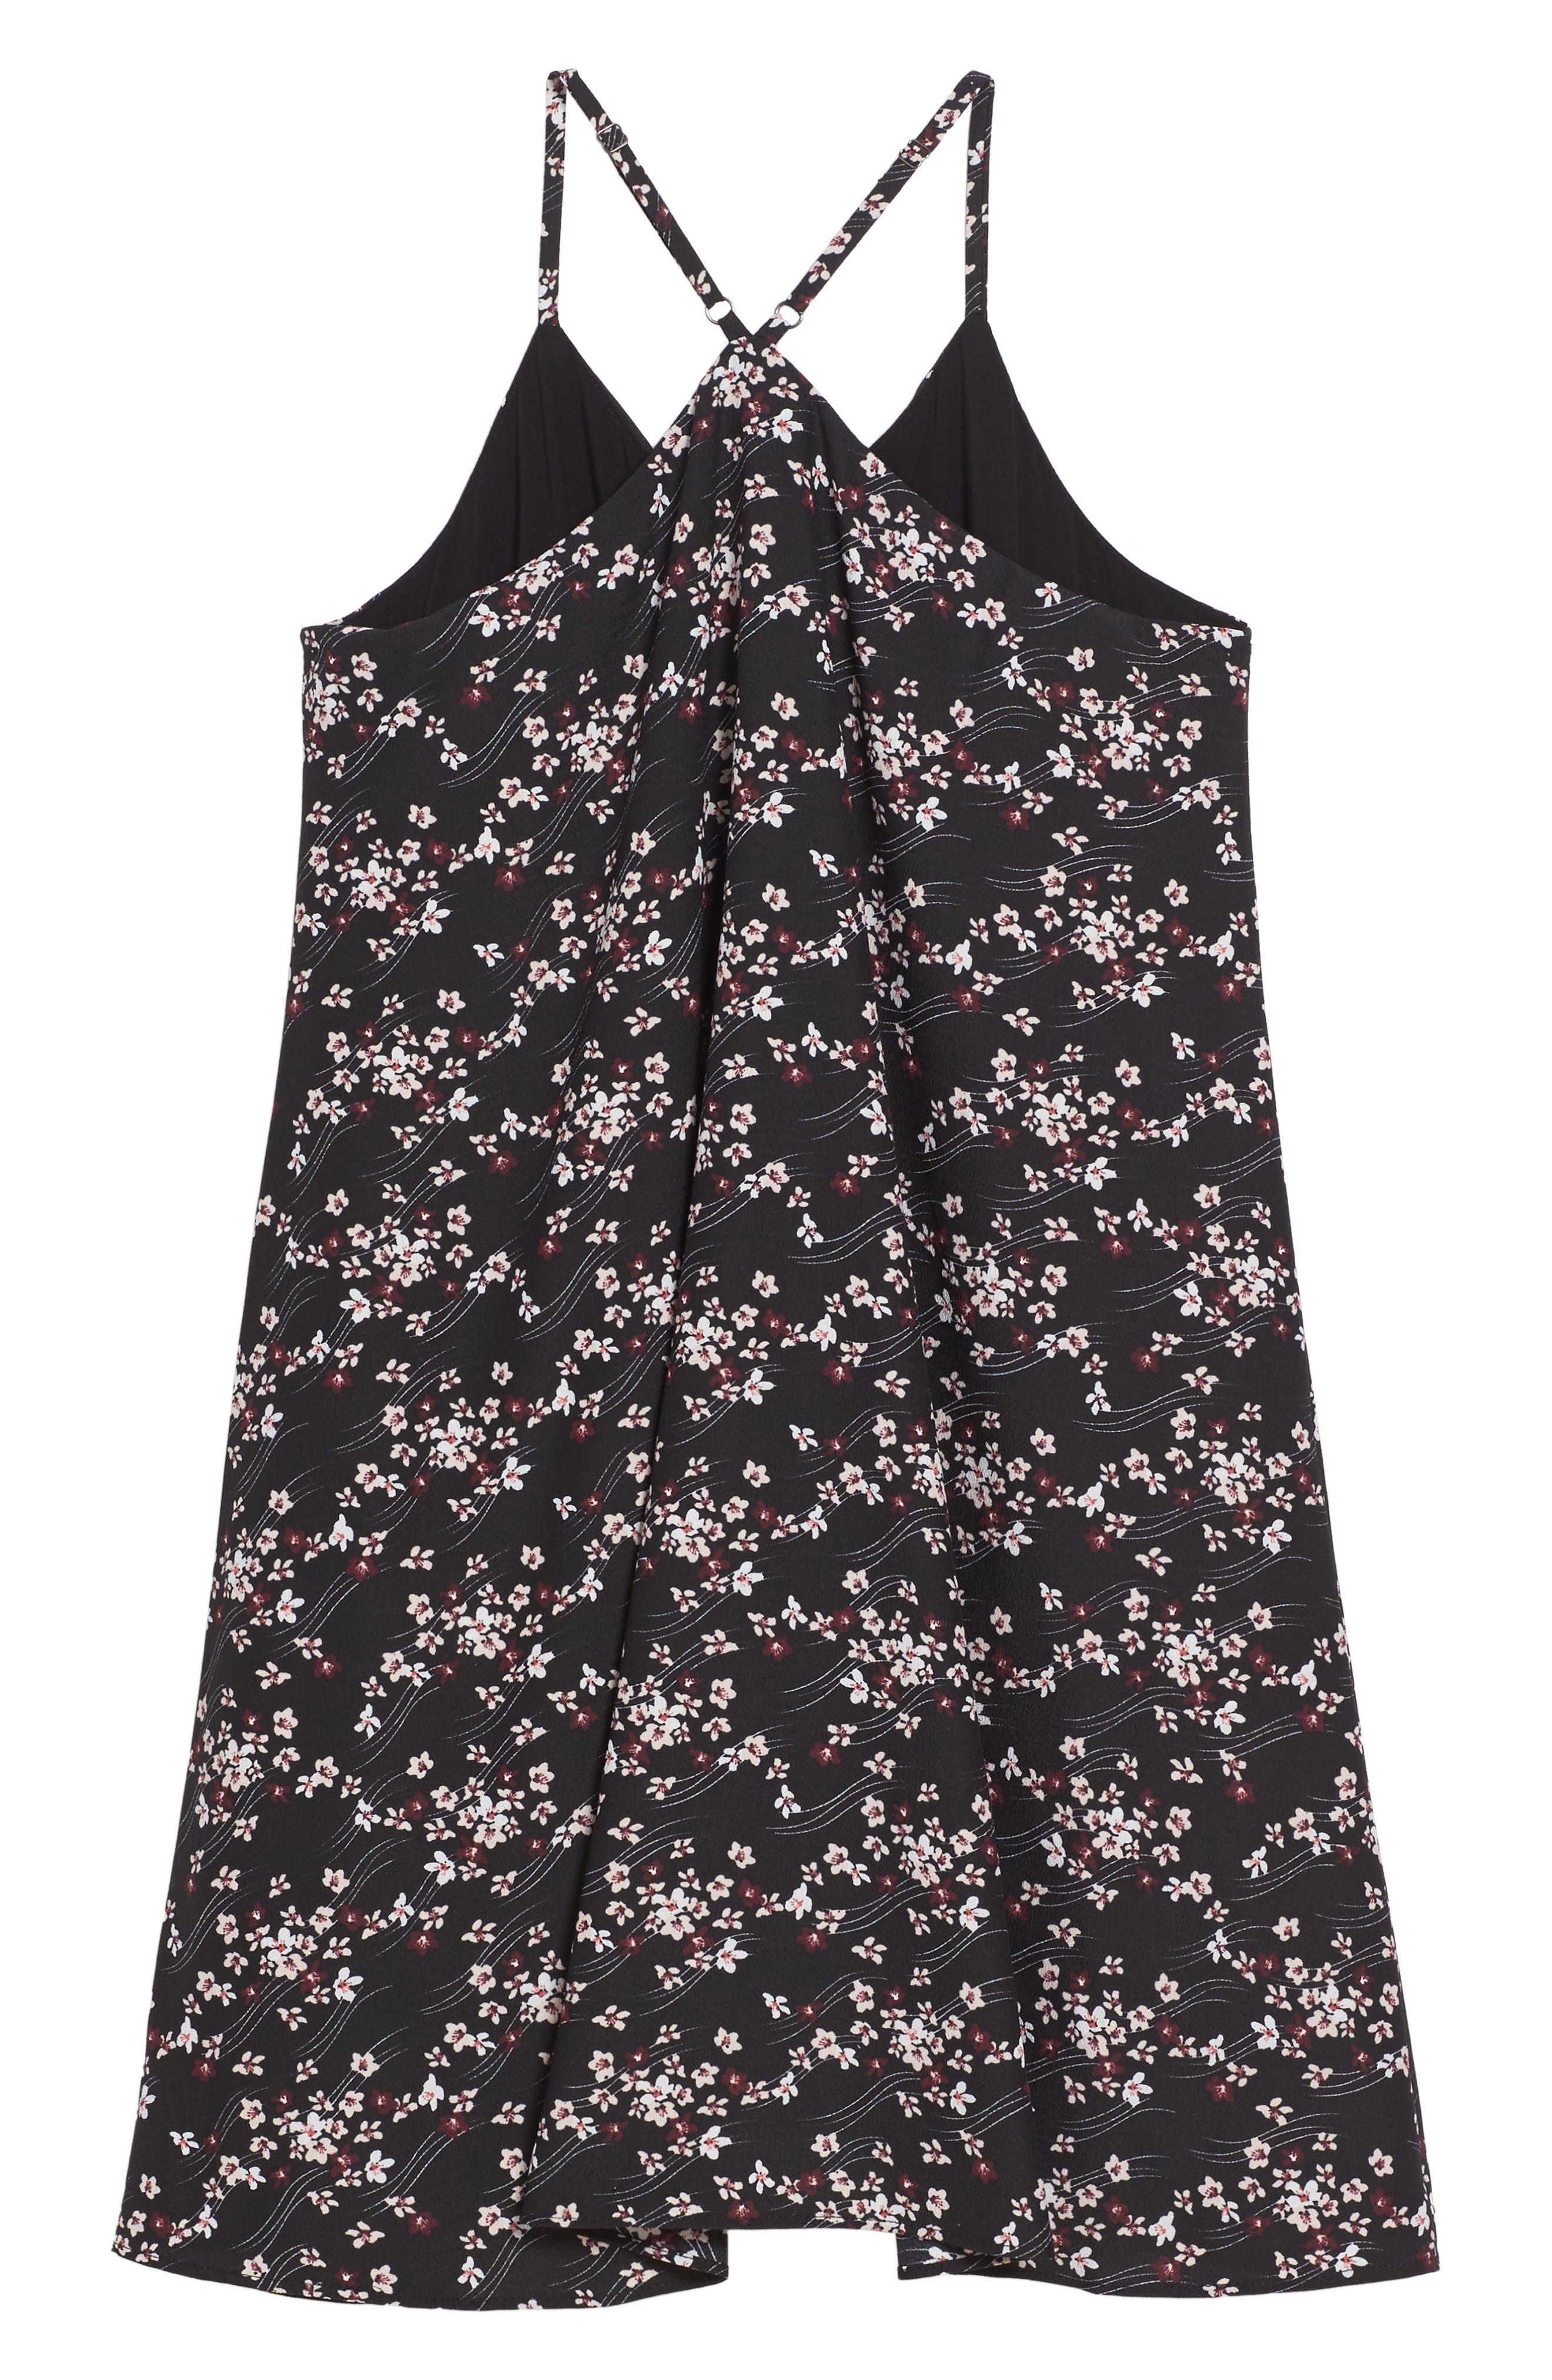 Floral Print Slip Dress,                             Alternate thumbnail 2, color,                             002